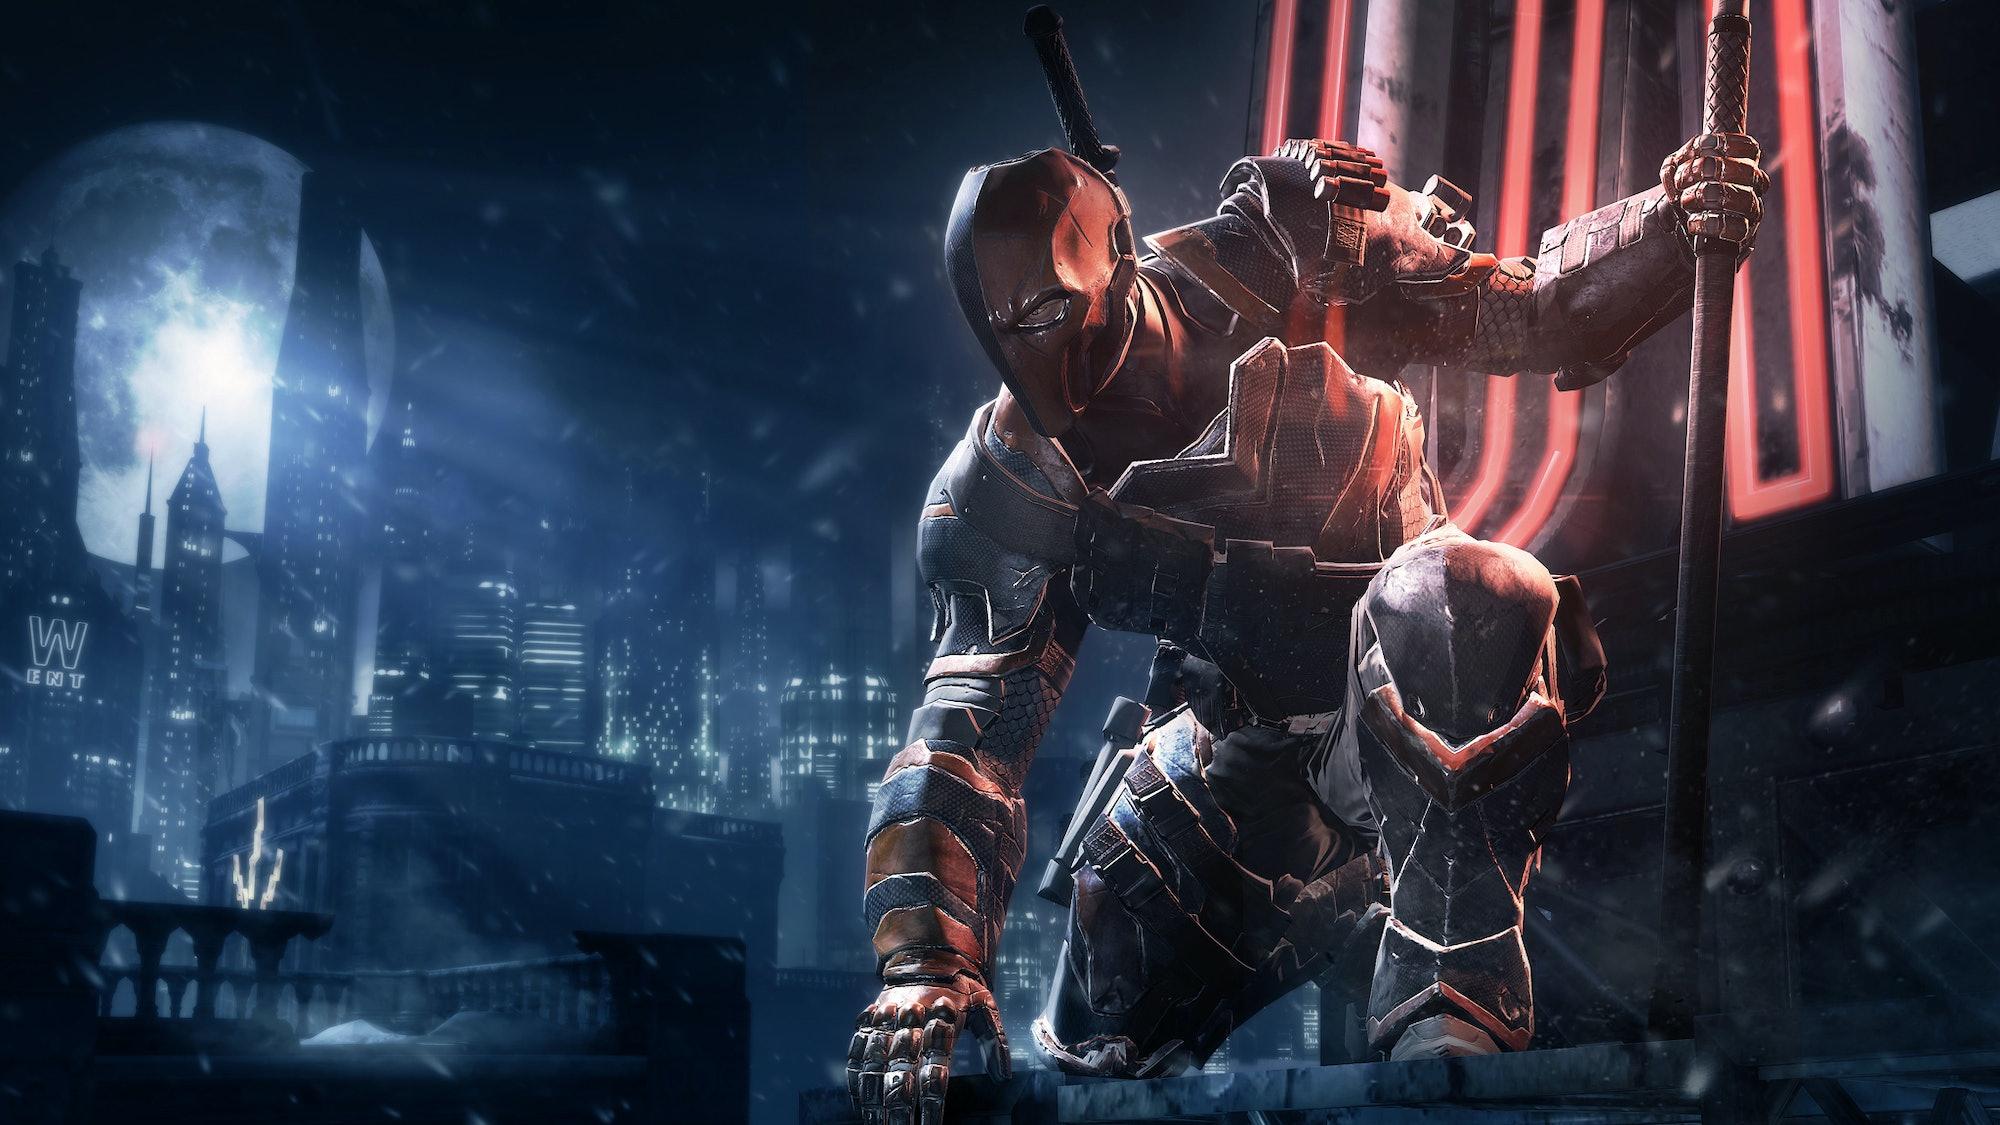 'Batman: Arkham Origins' is one DLC that'll be included.